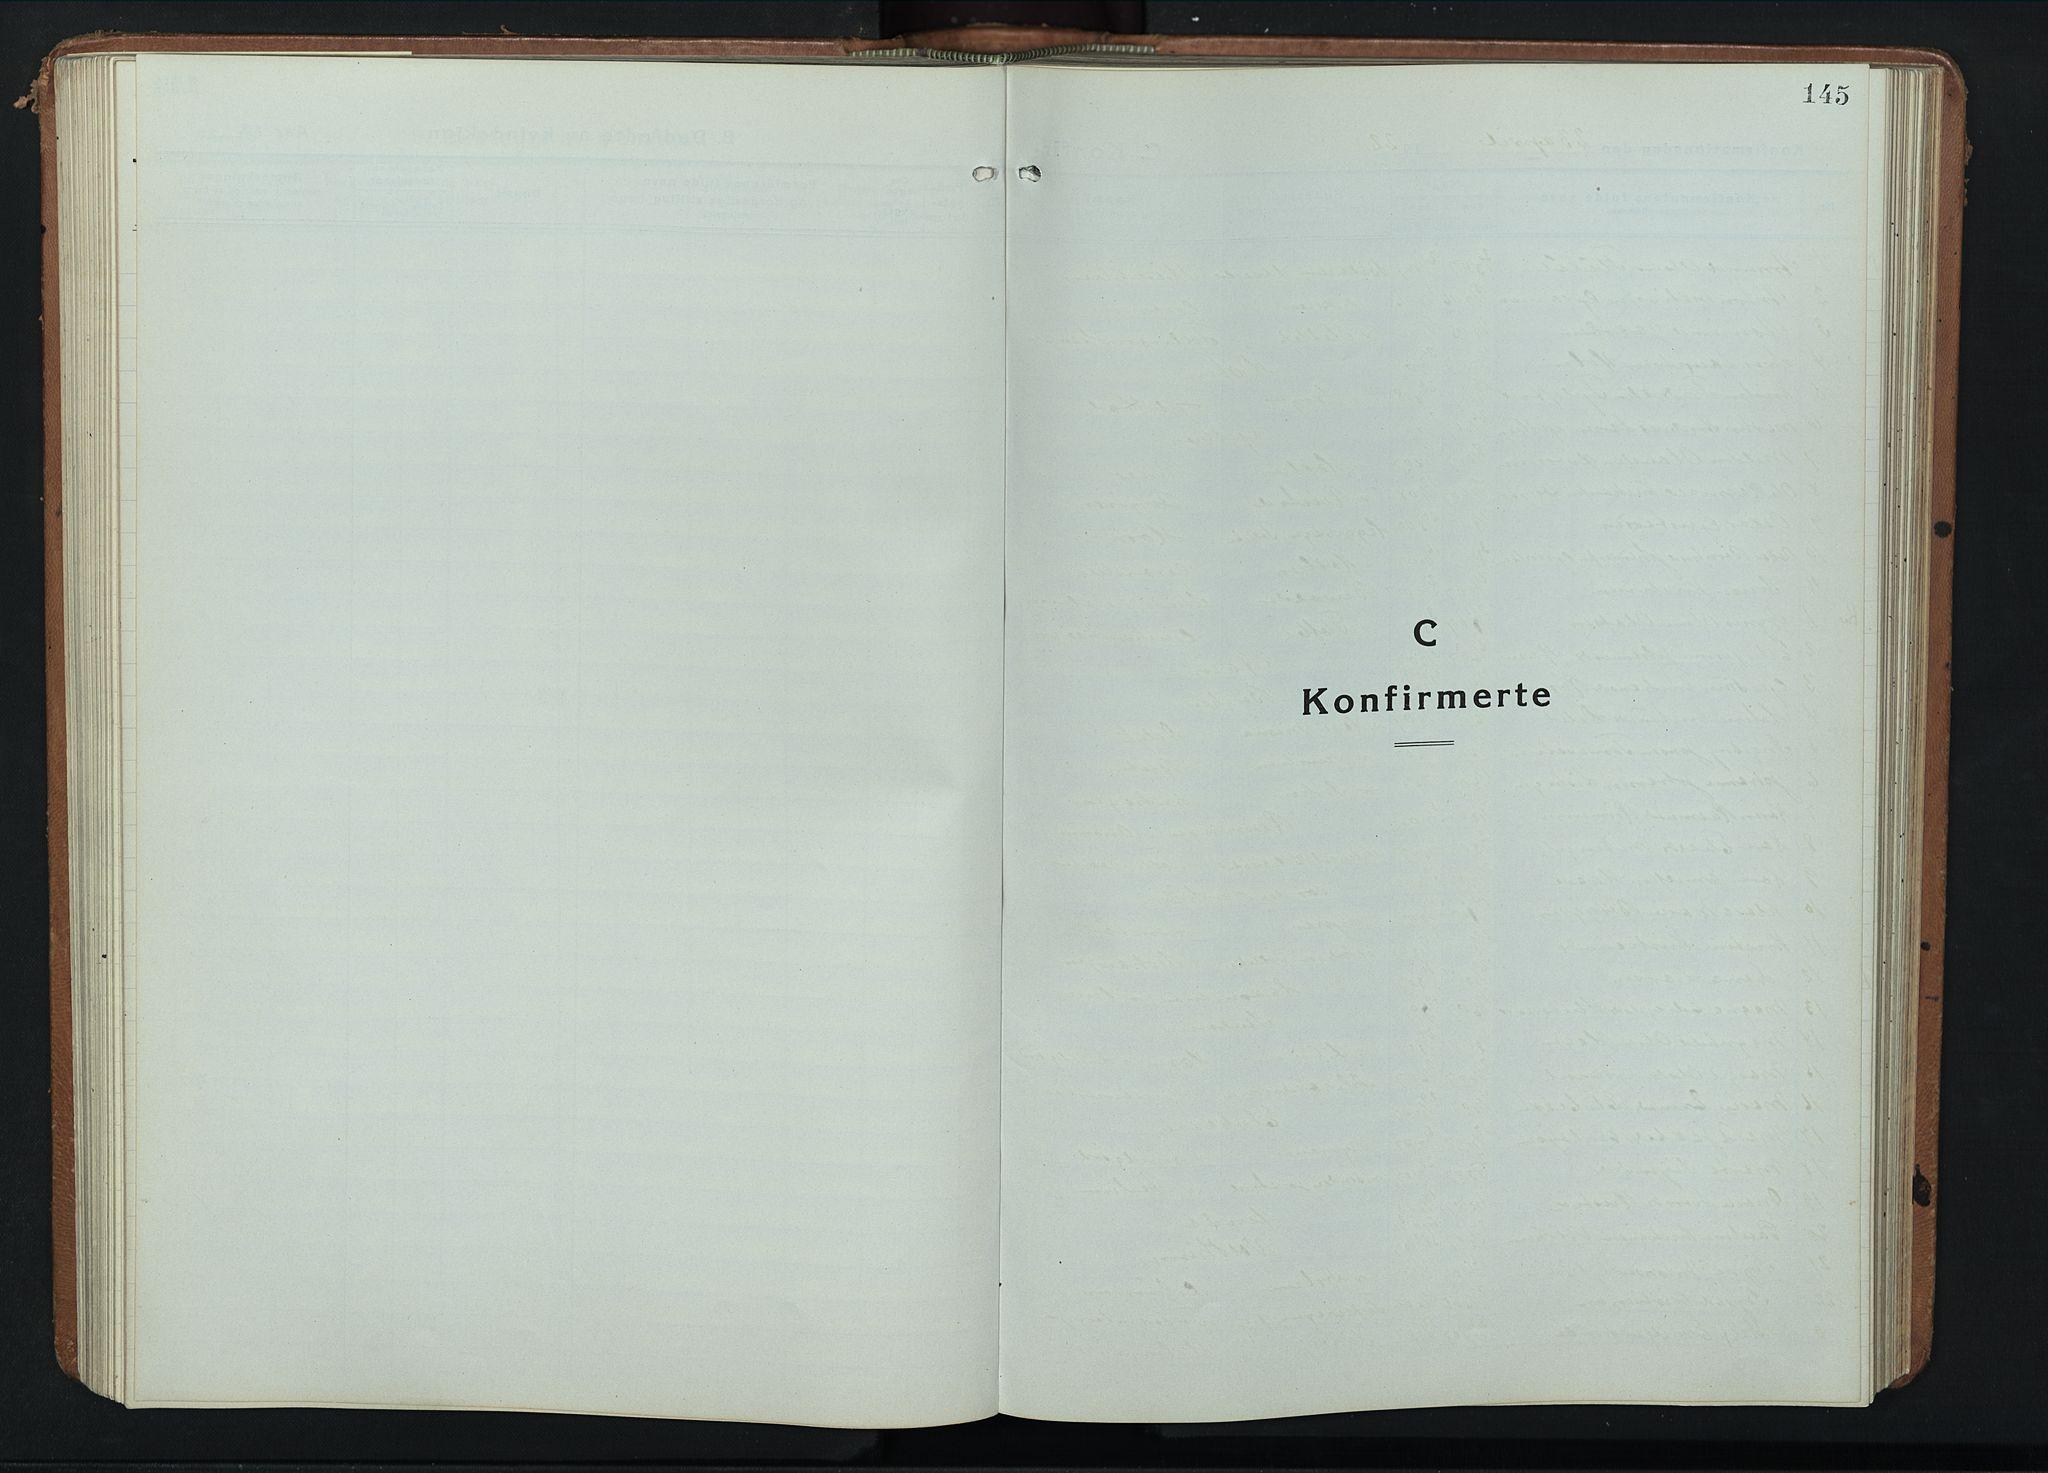 SAH, Fåberg prestekontor, Klokkerbok nr. 14, 1922-1946, s. 145